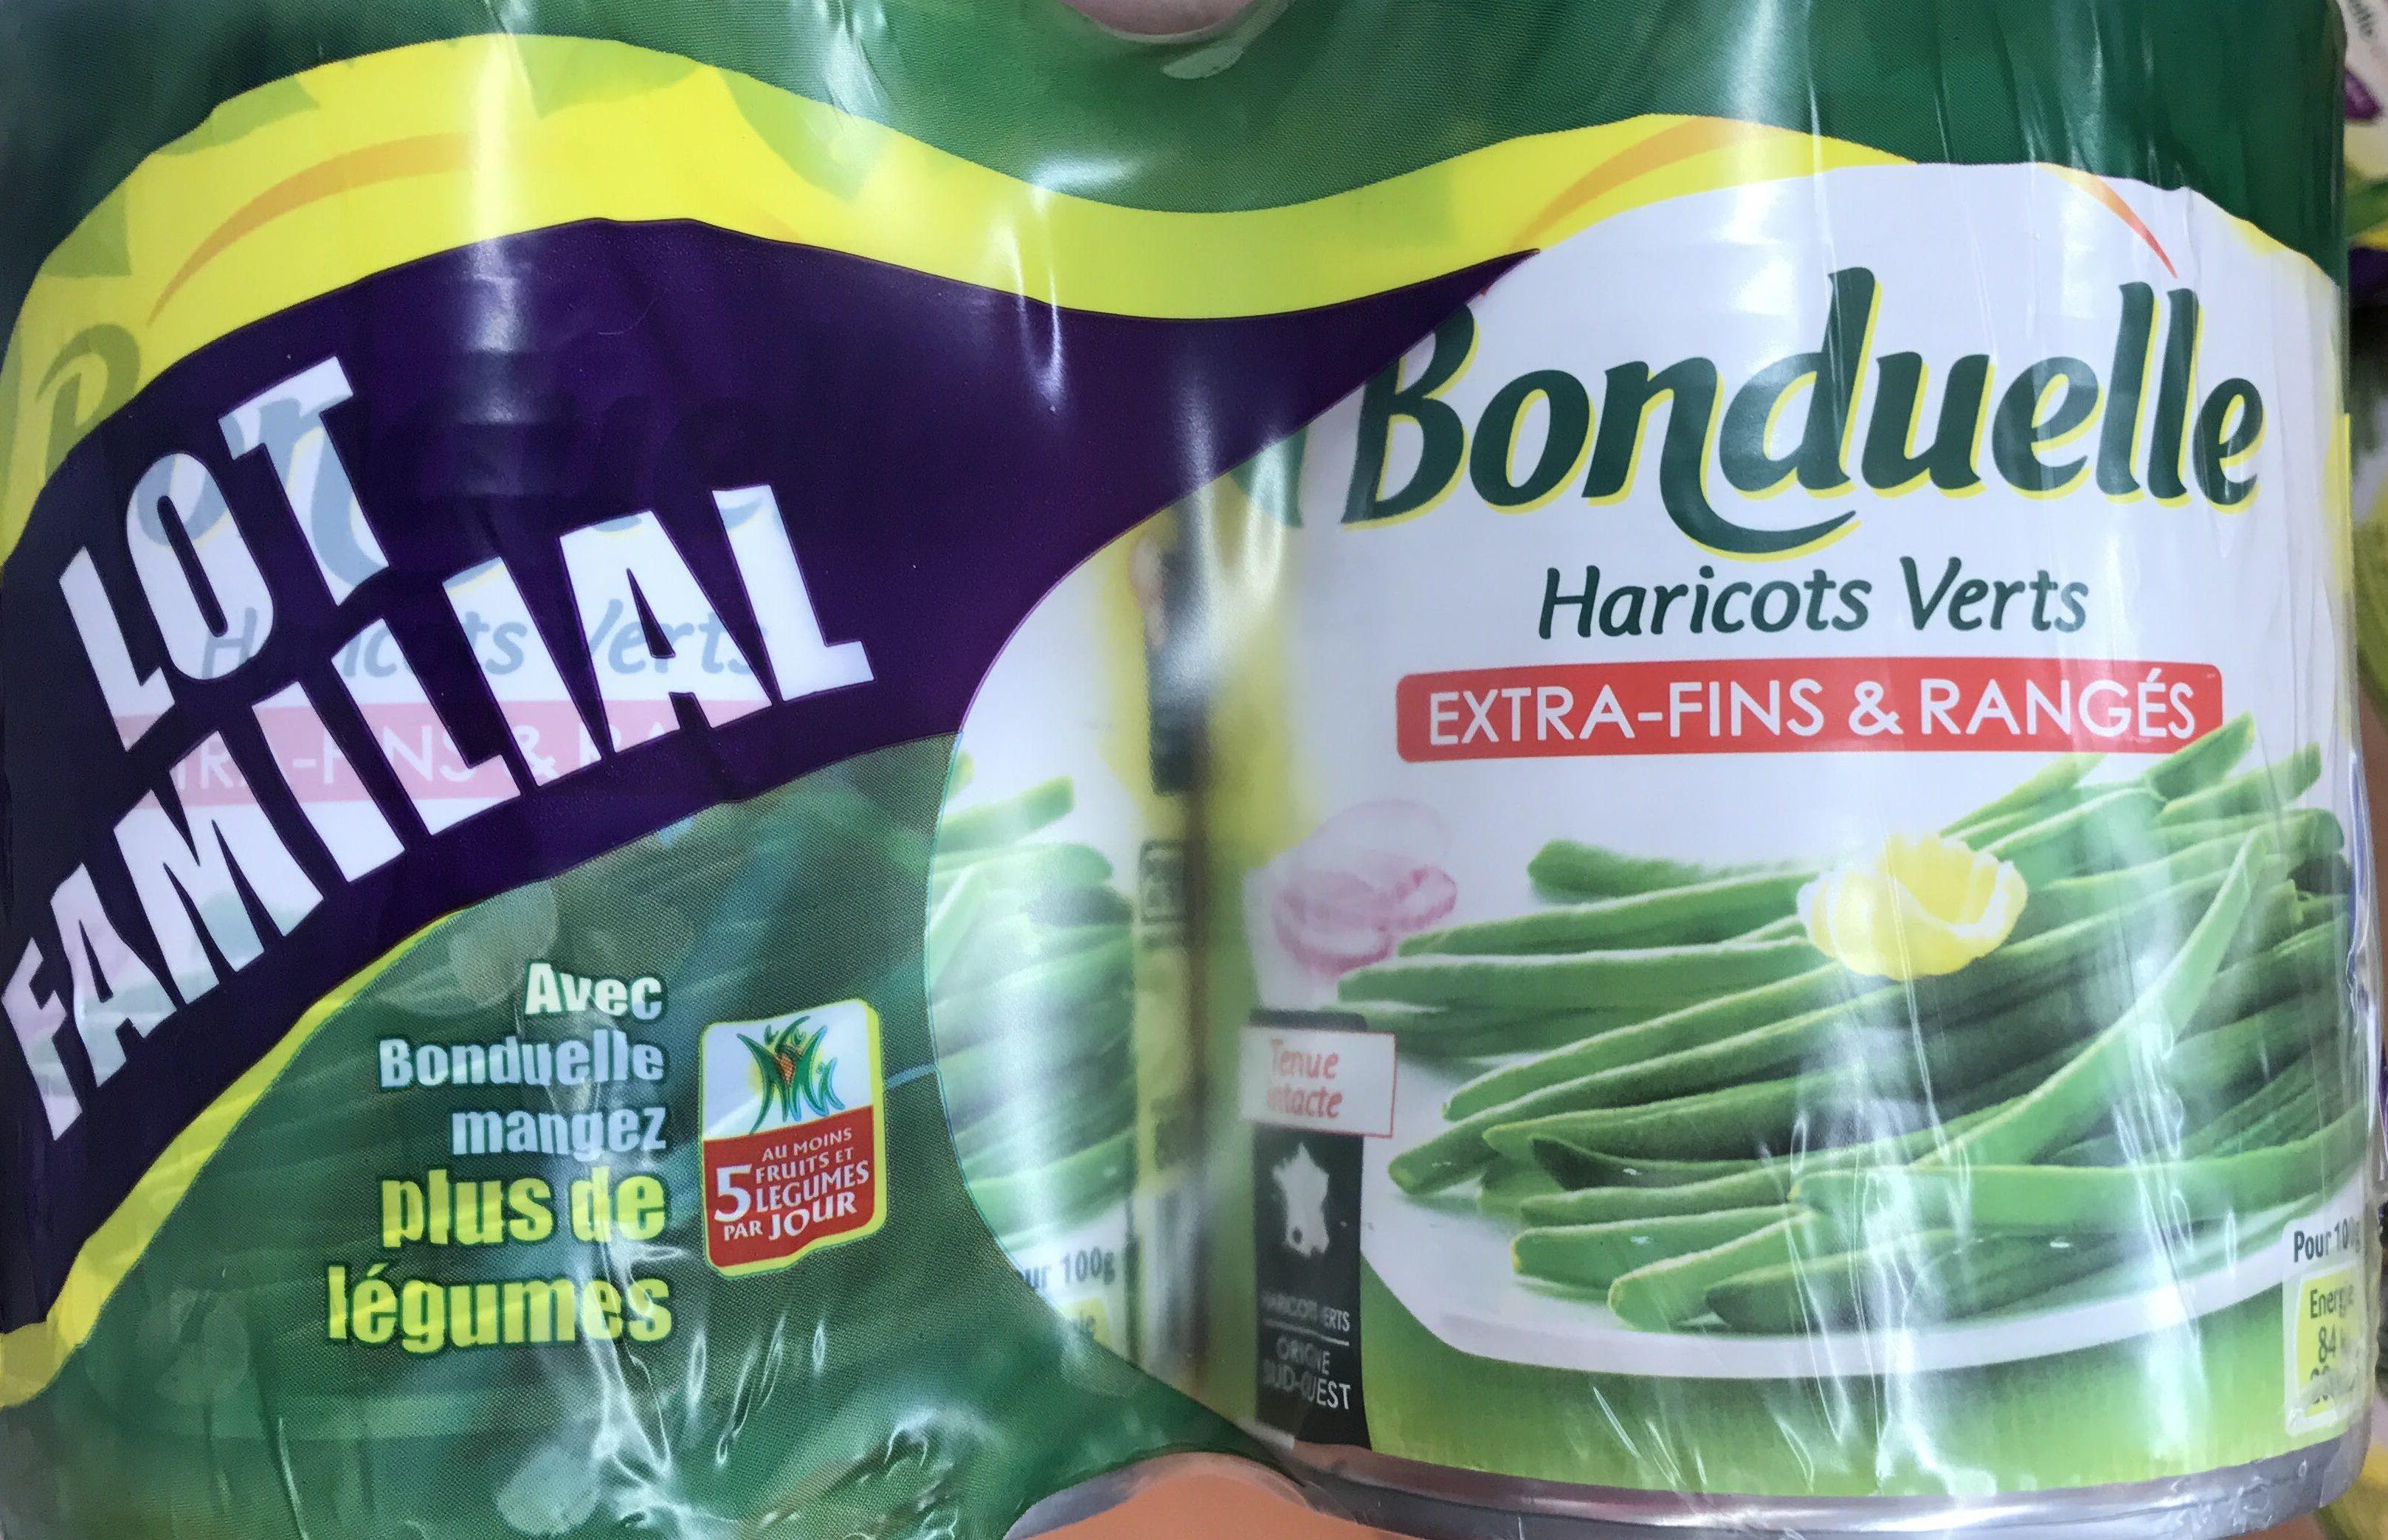 Haricots Verts Extra Fins X2 Bonduelle 880G Prix Choc - Produit